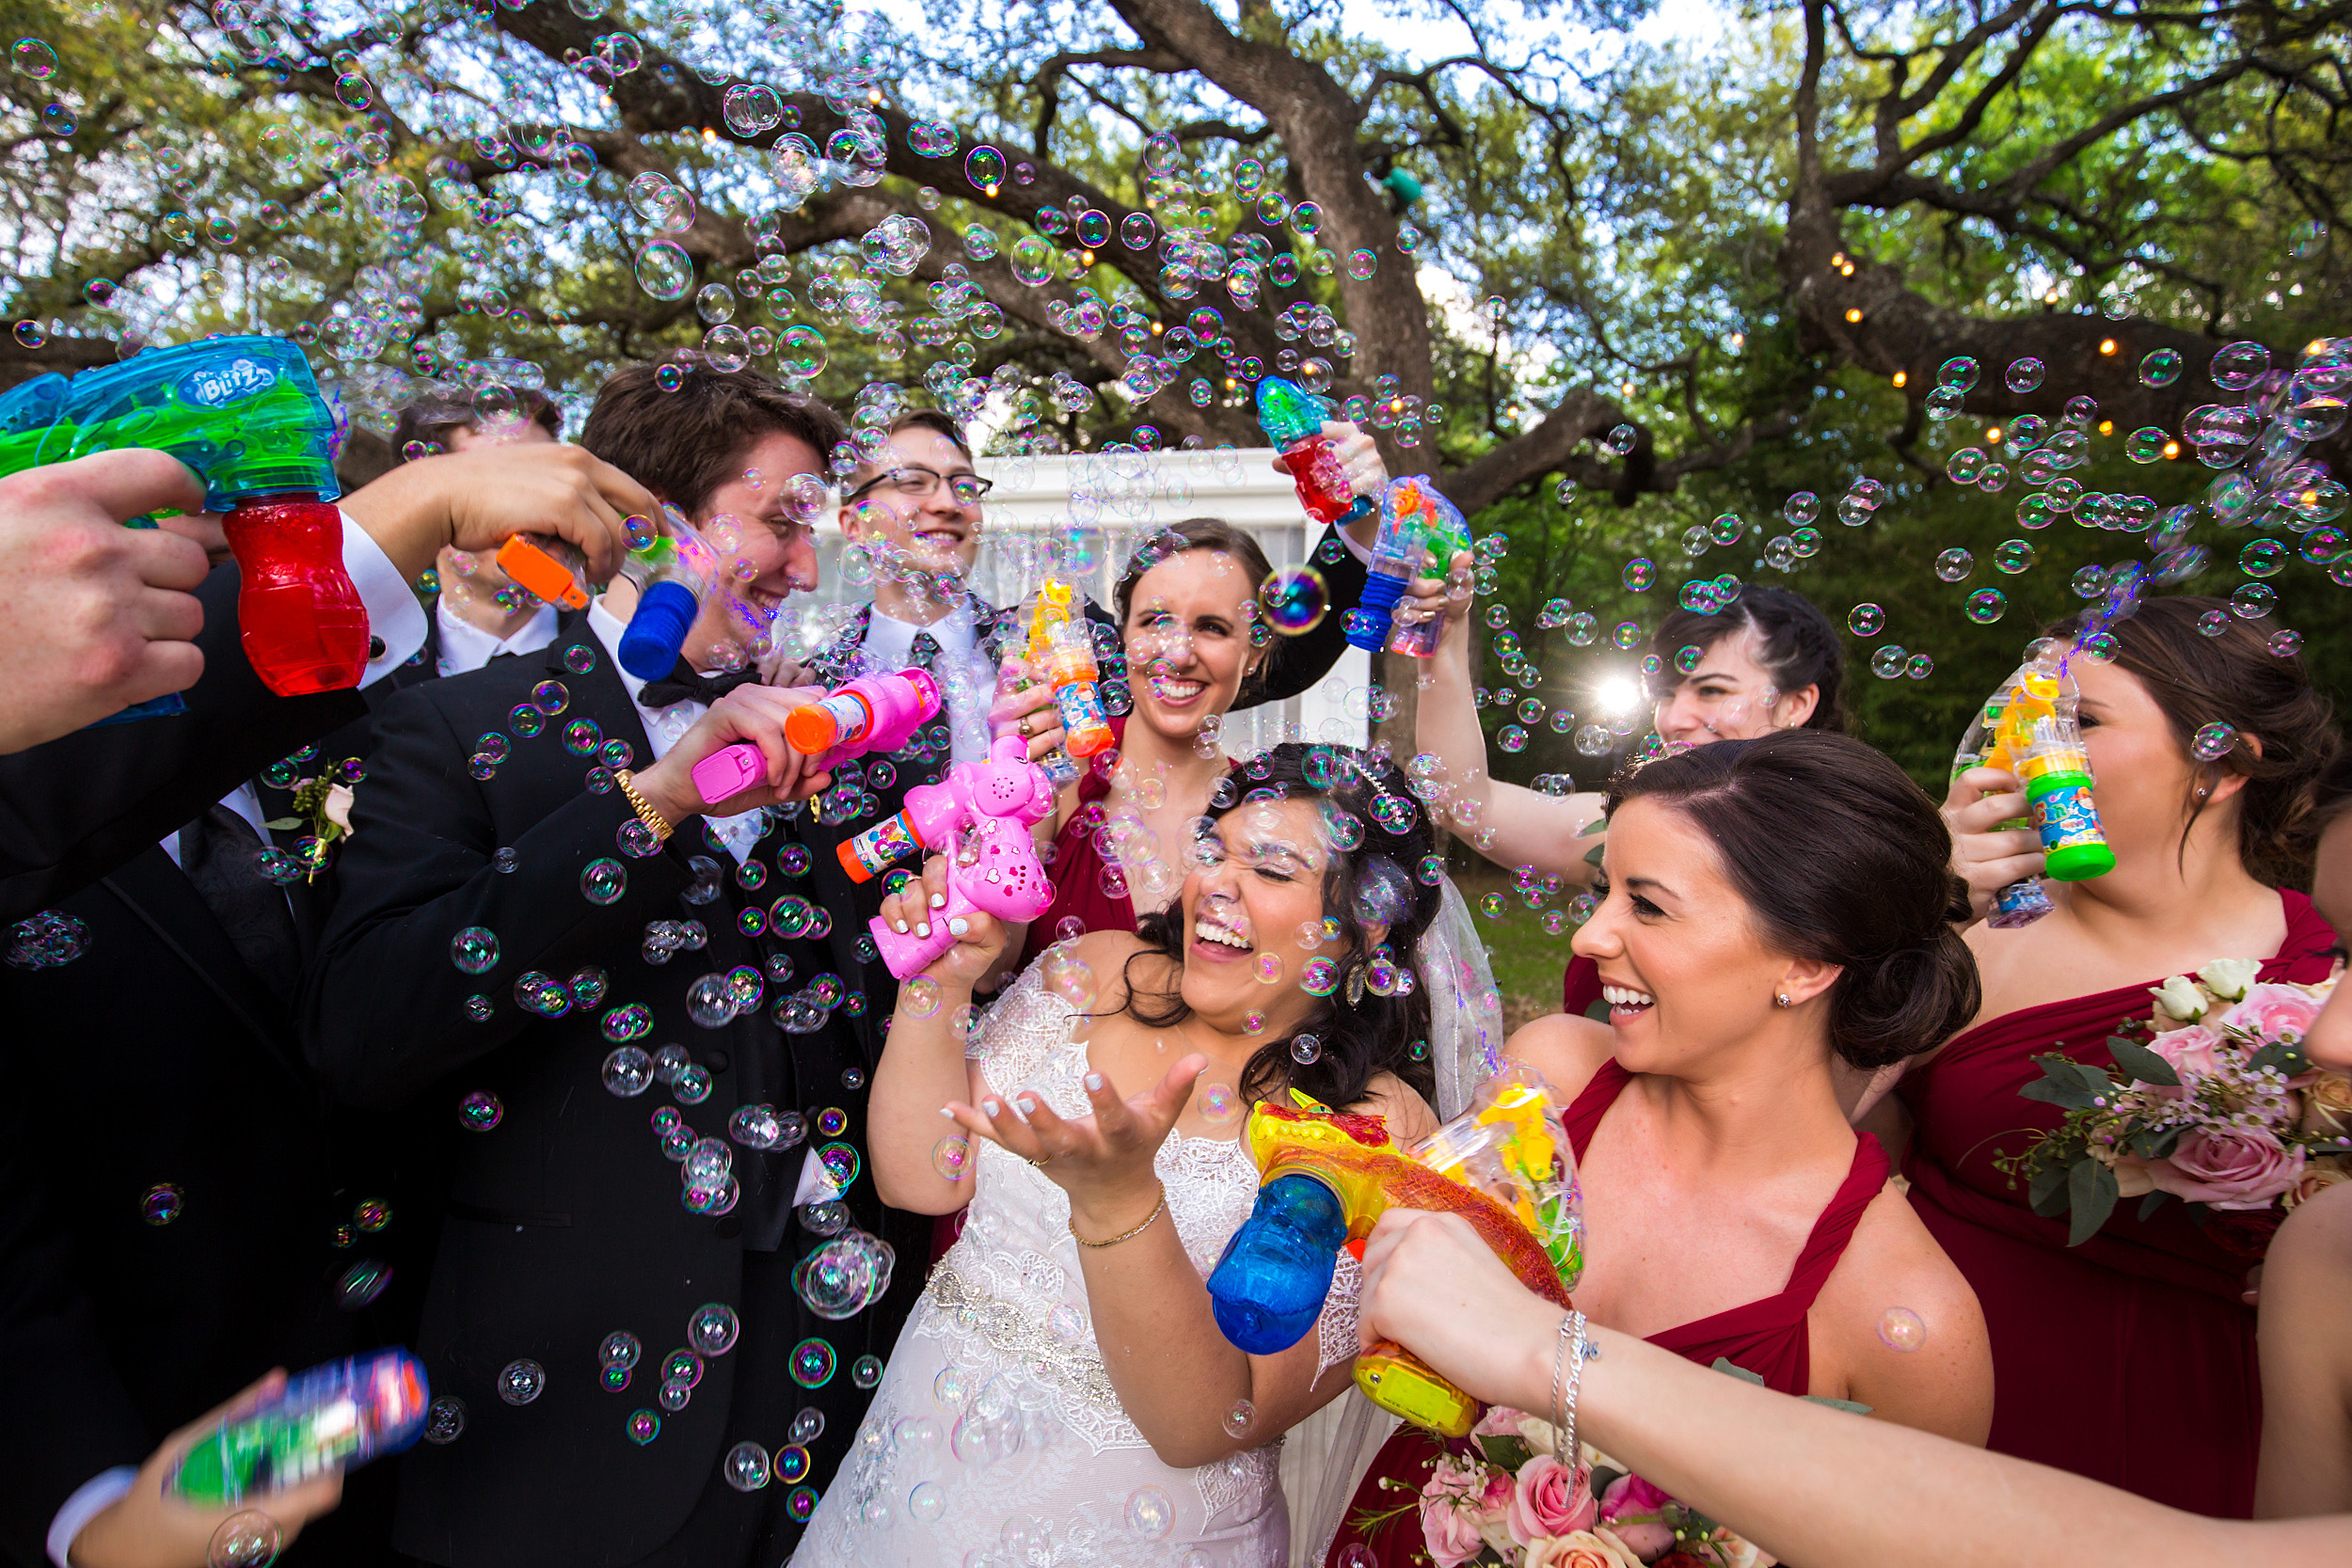 austin-wedding-mike-reed-30.jpg